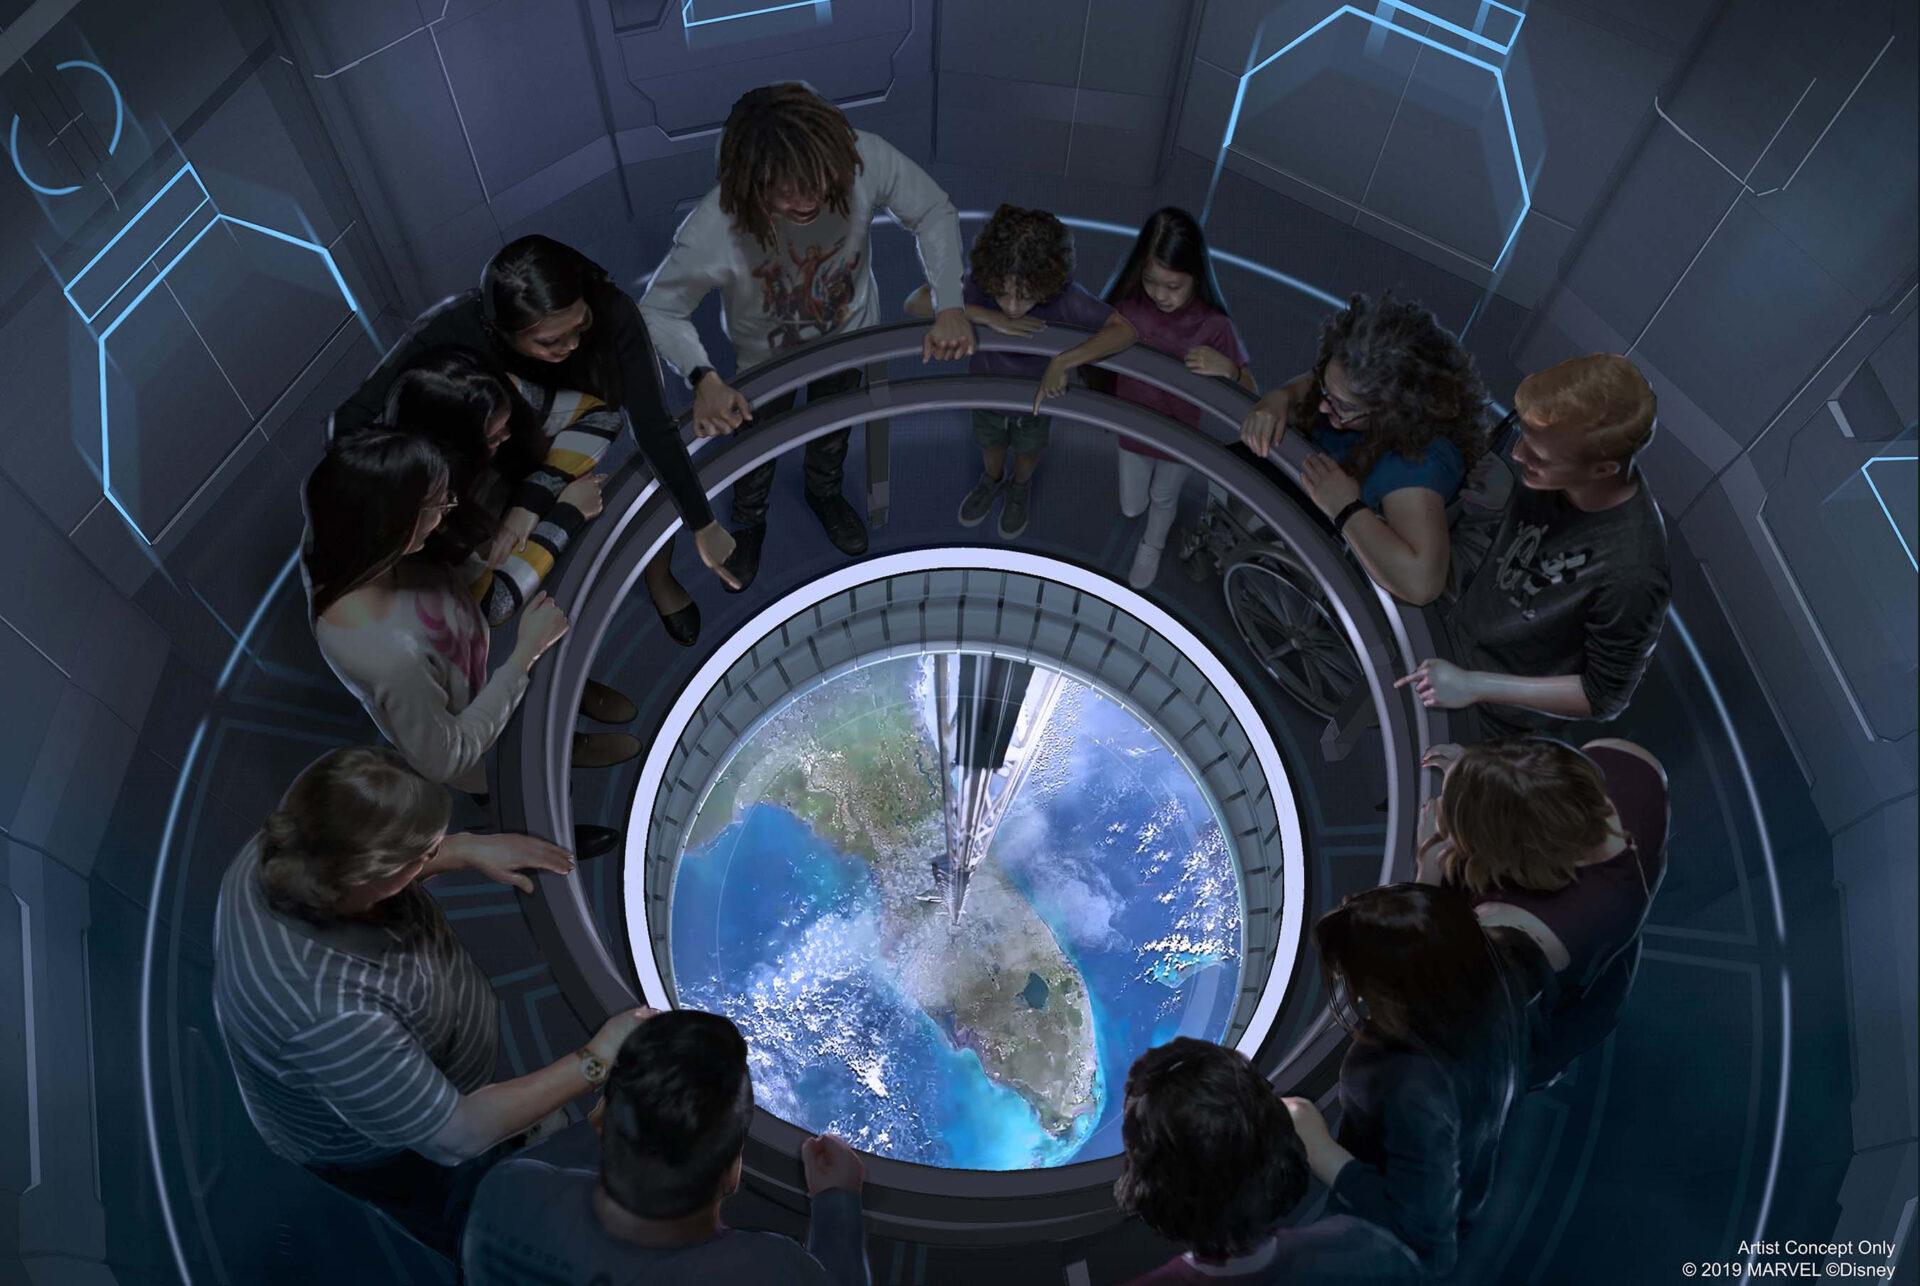 Major Additions Coming To Walt Disney World Through 2021